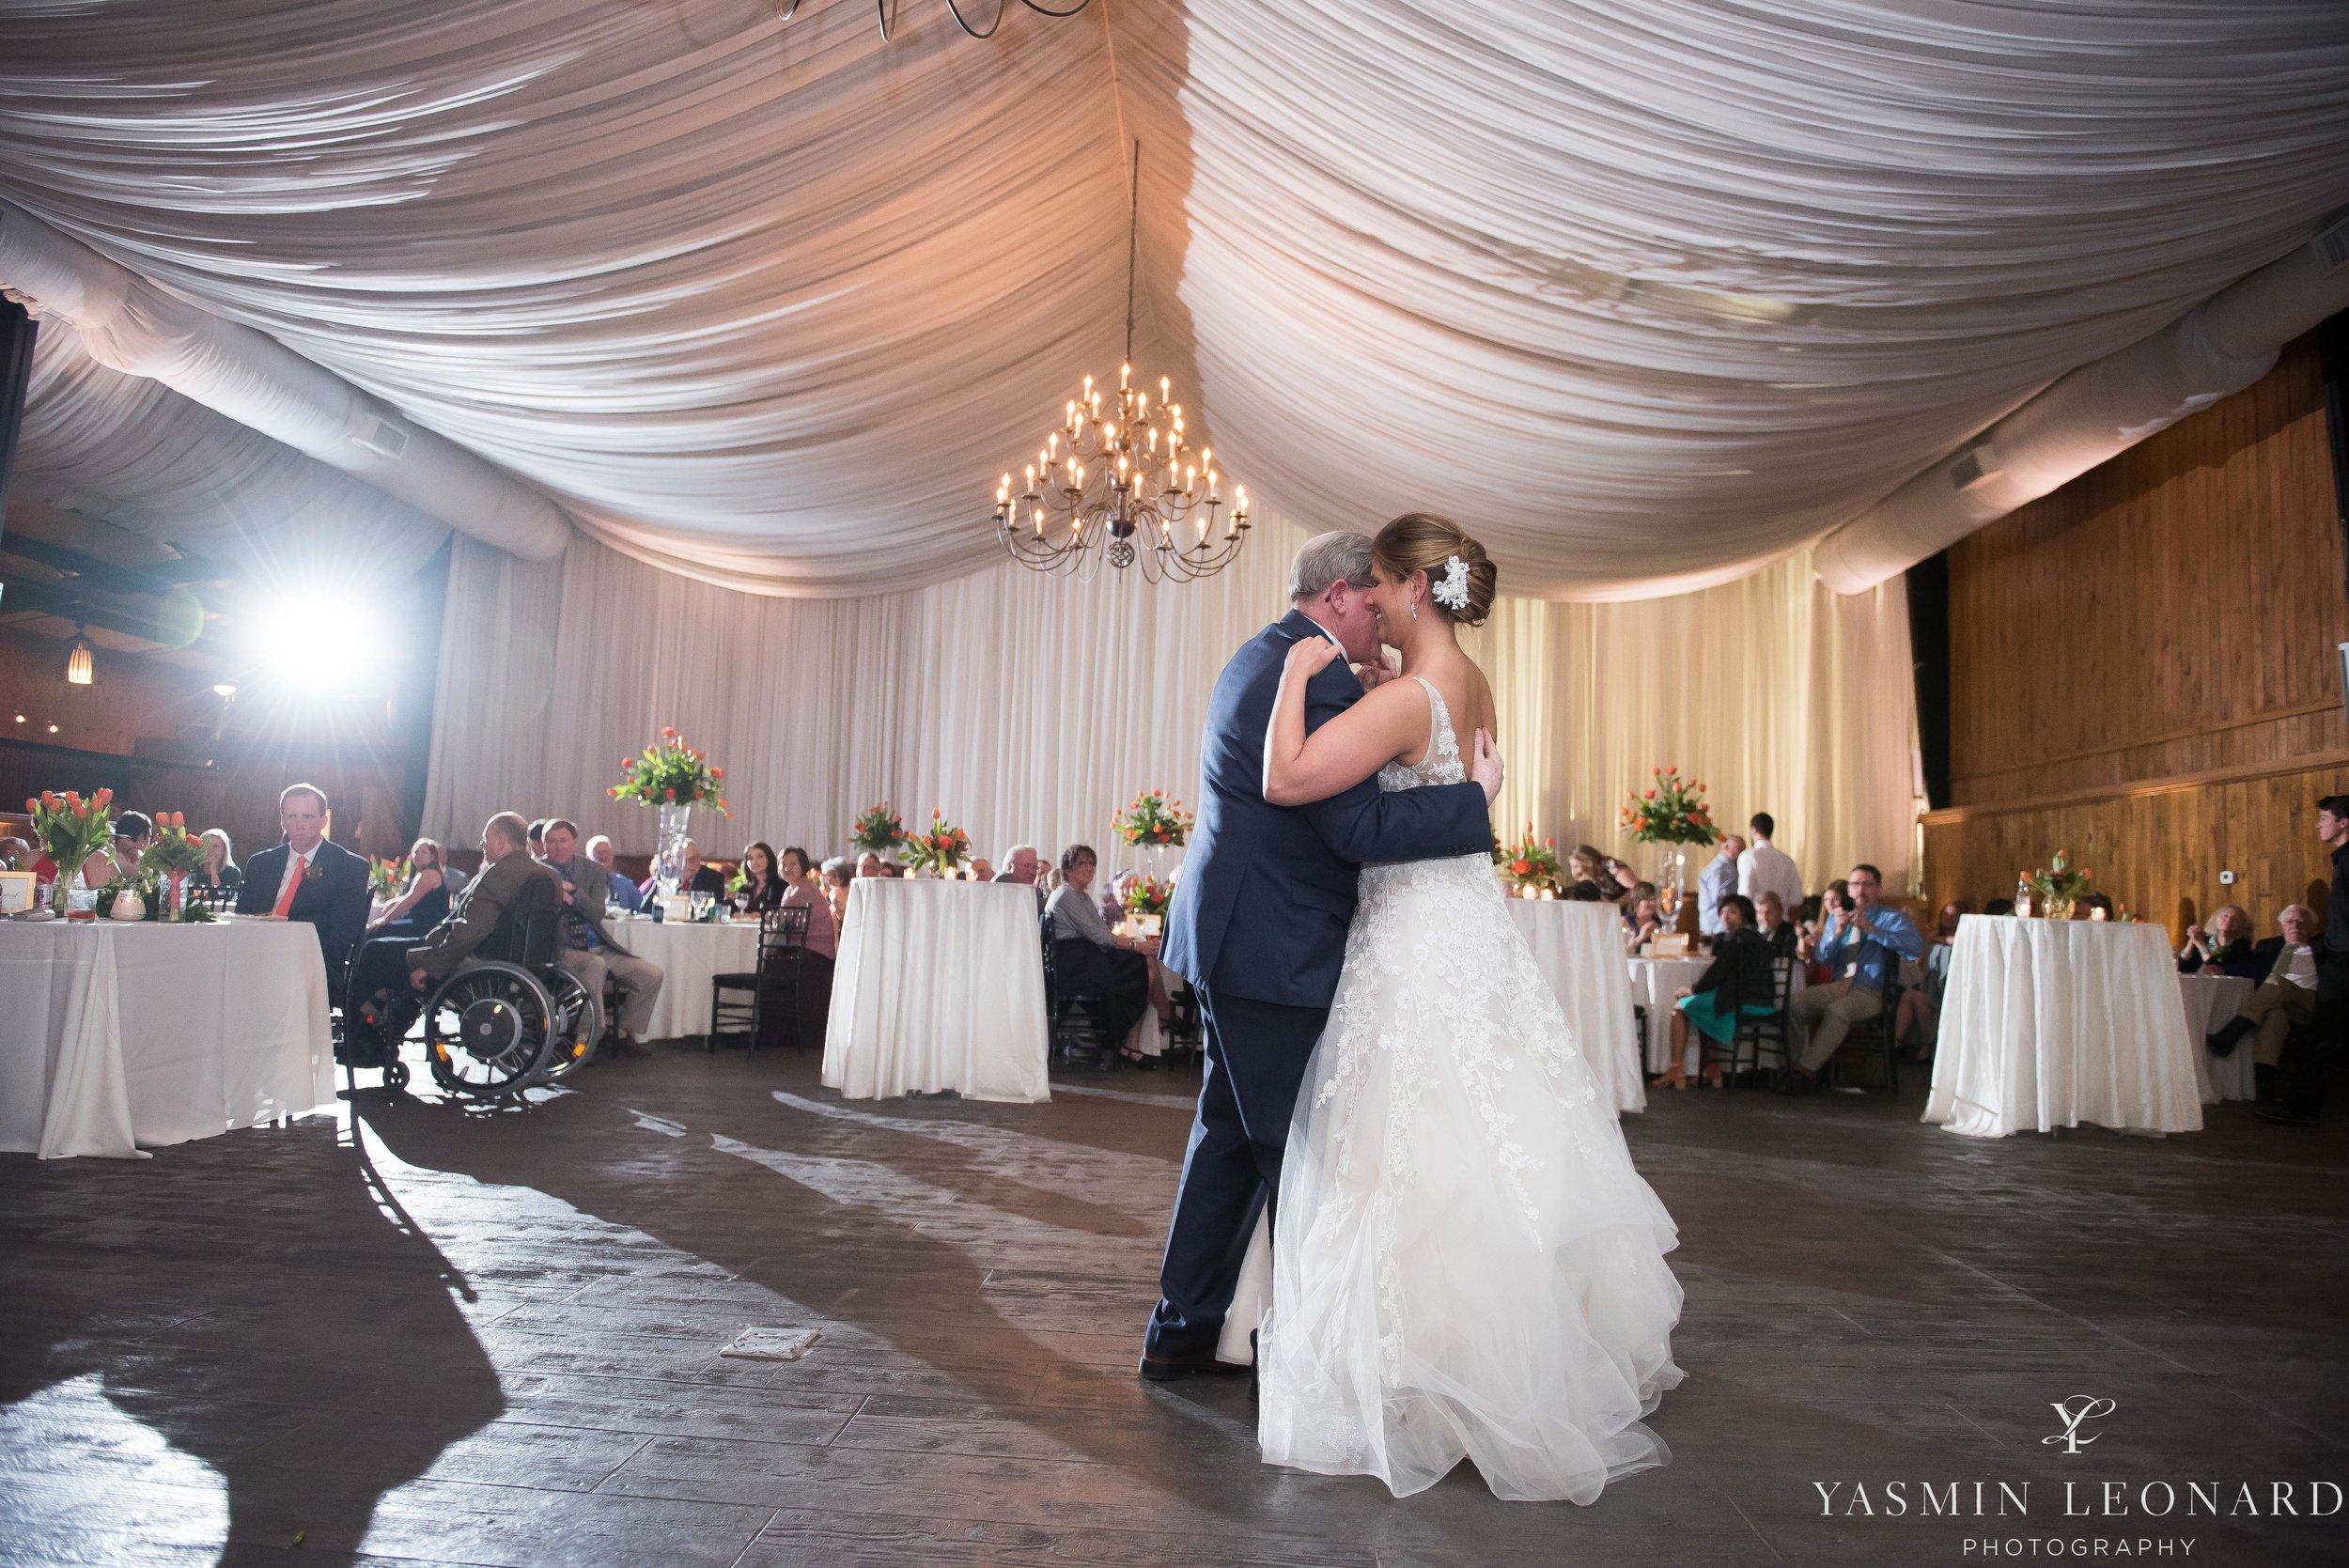 Adaumont Farm - Adaumont Farm Weddings - Trinity Weddings - NC Weddings - Yasmin Leonard Photography-70.jpg